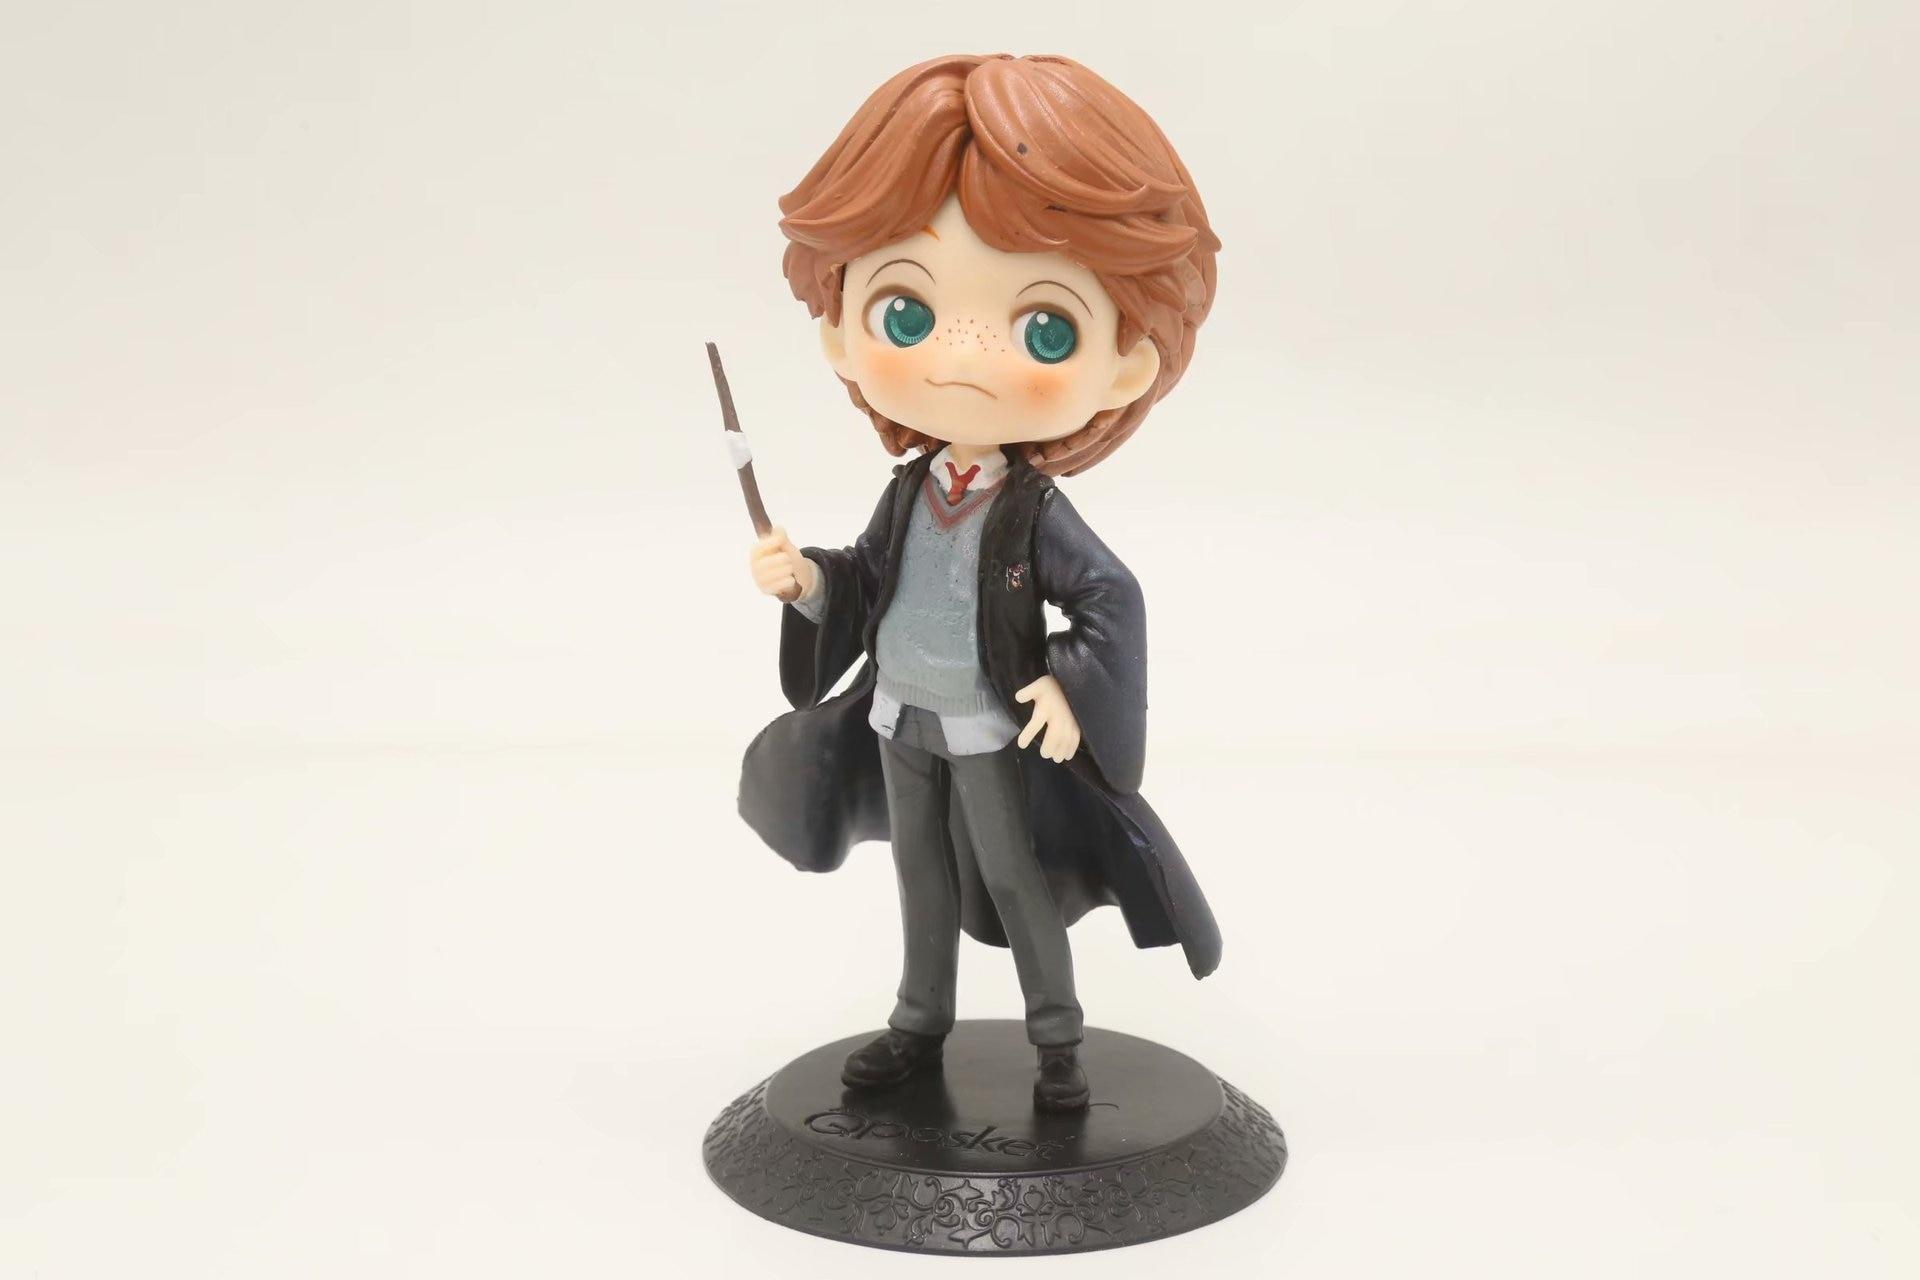 QPosket Cute Big eyes Ron Weasley in Movie Harry Potter Figure Model Toys 15cm